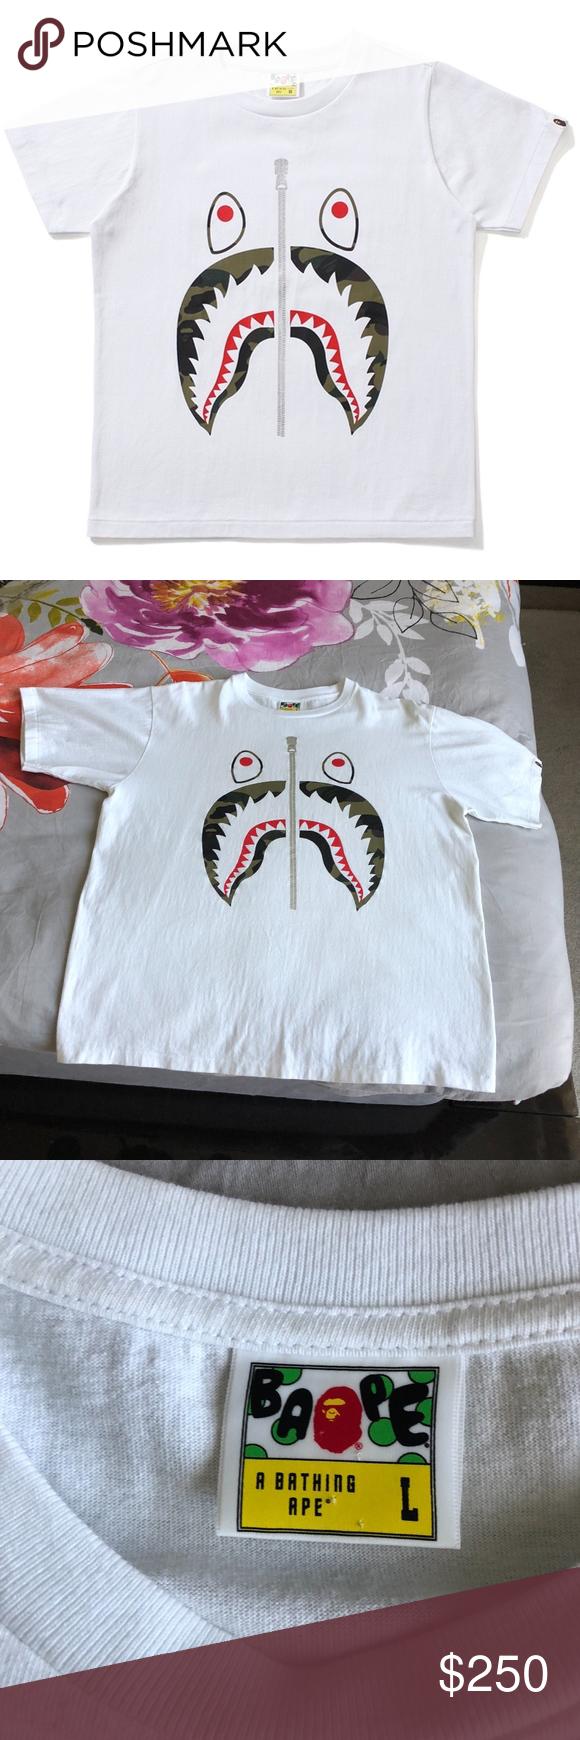 1c878469 BAPE City Camouflage SHARK Tee T-shirt White L A BATHING APE BAPE CITY CAMO  SHARK